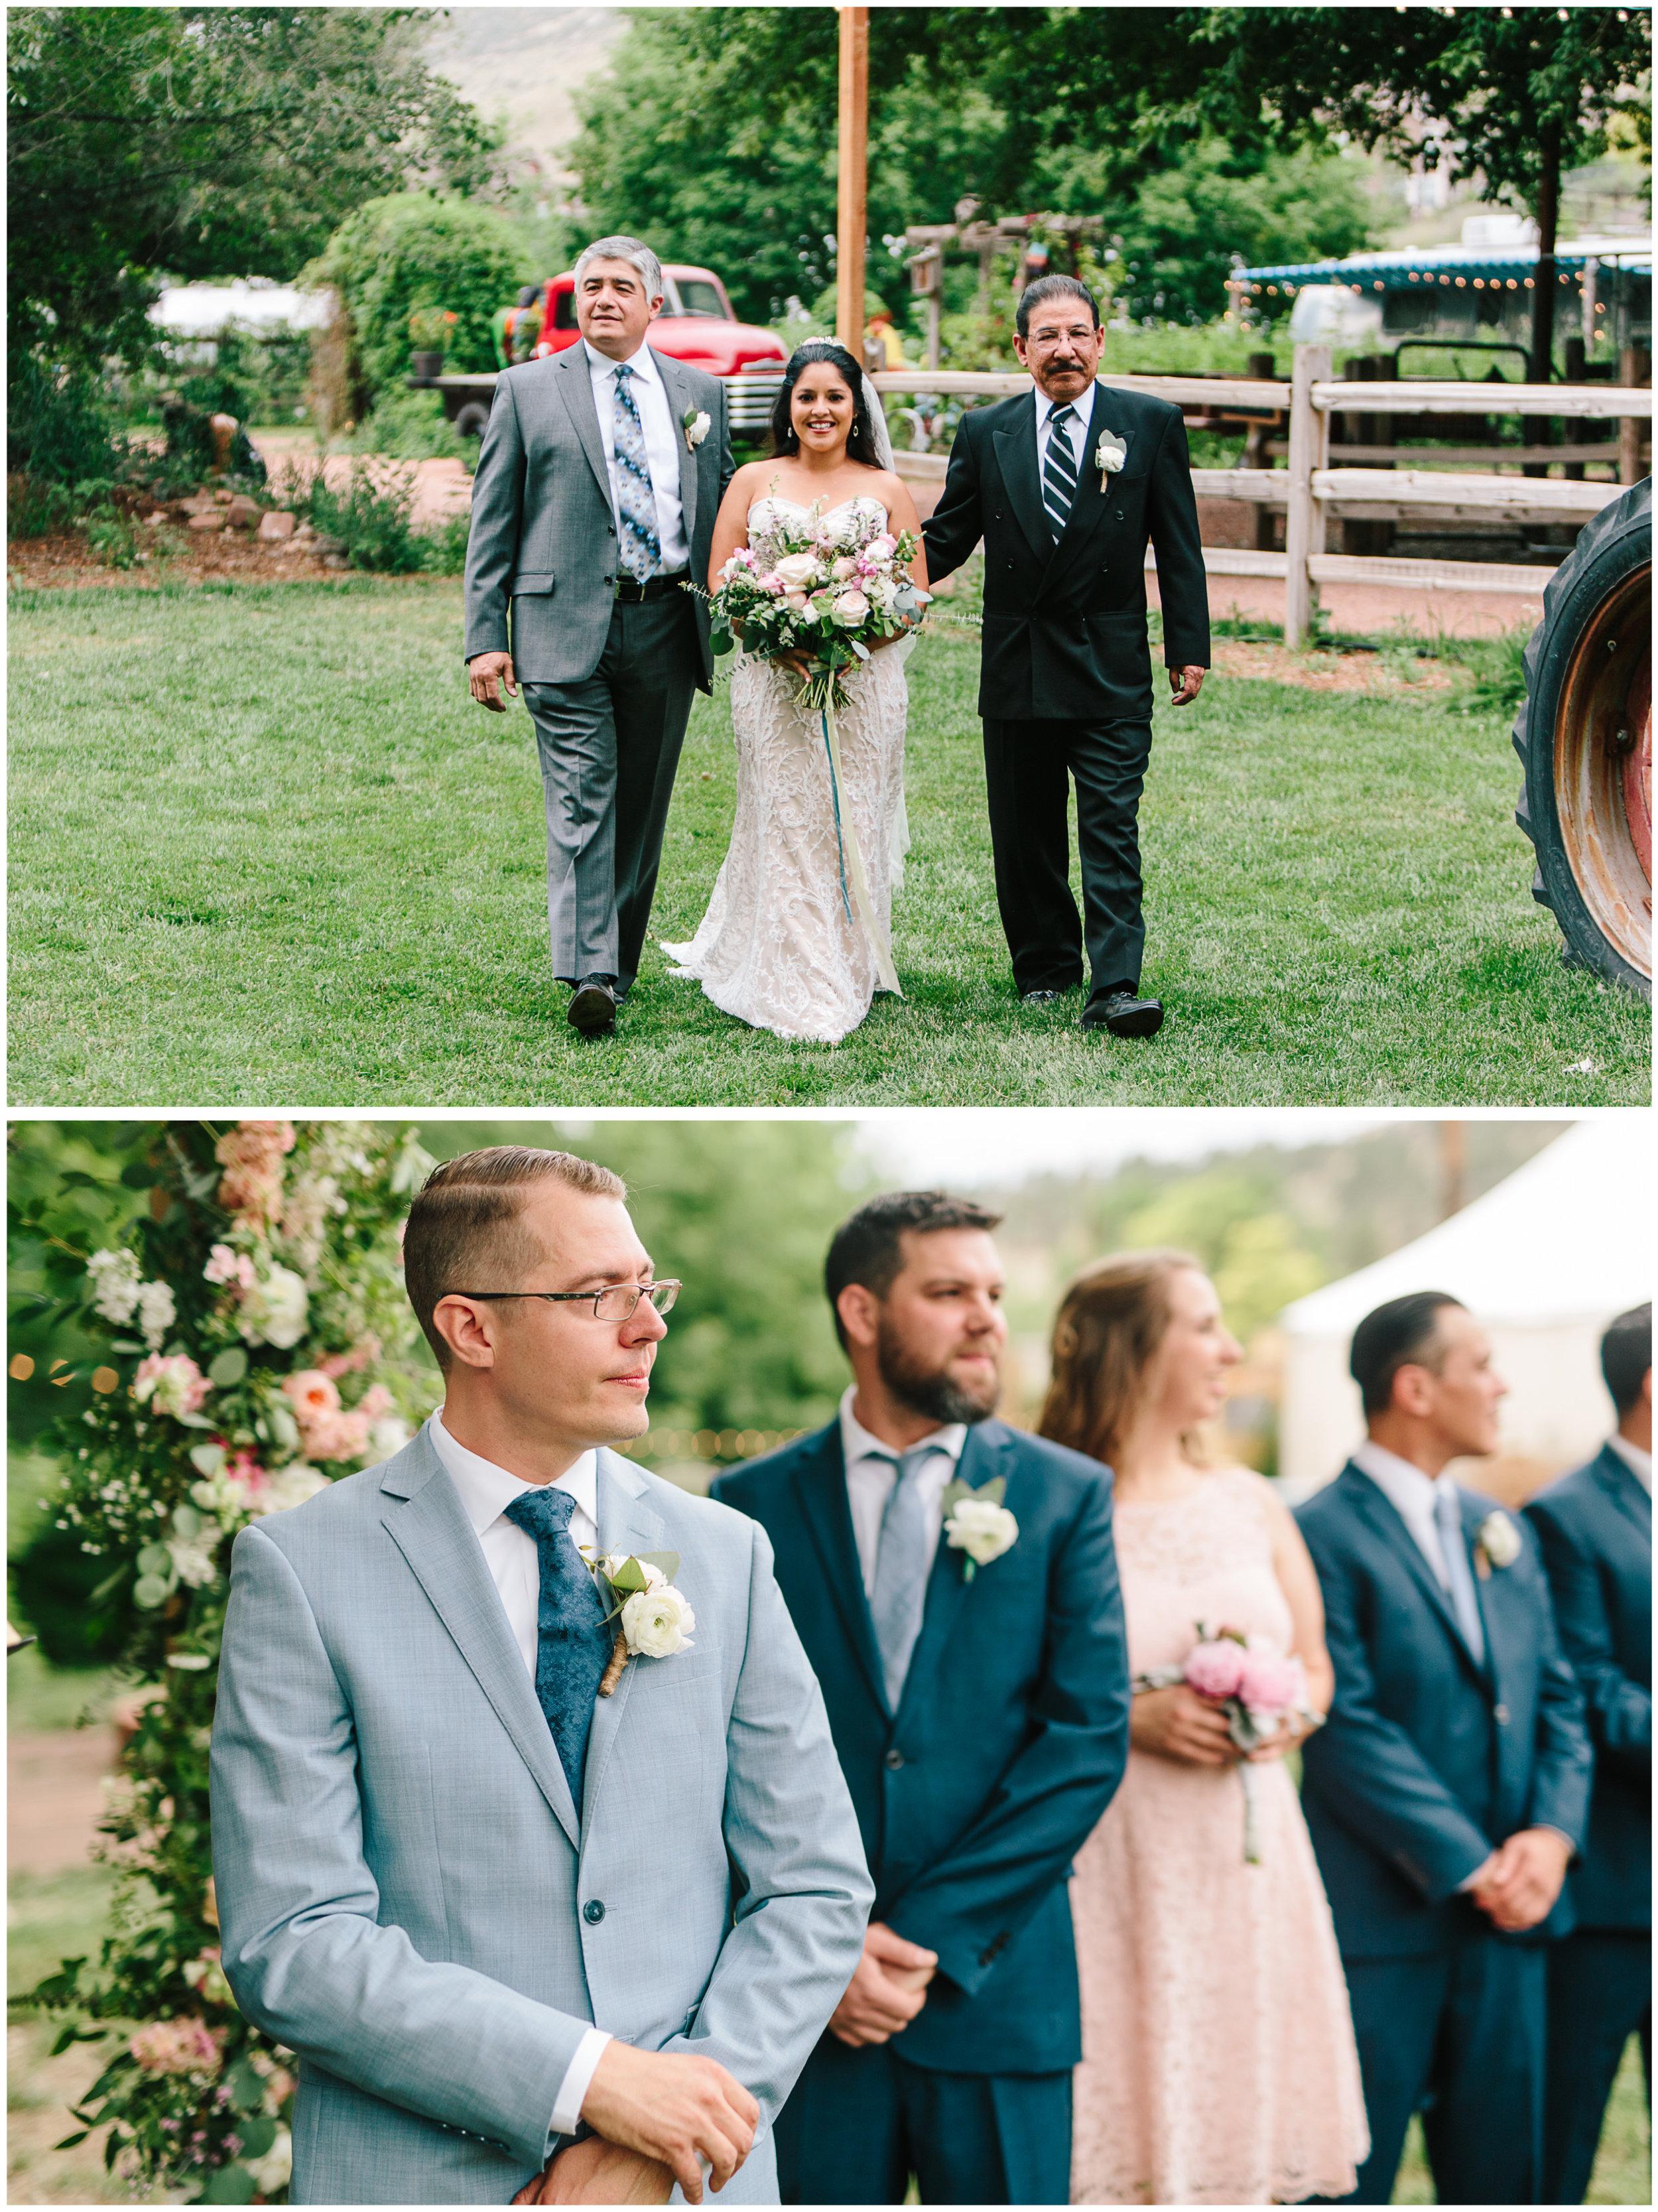 lyons_farmette_wedding_22.jpg